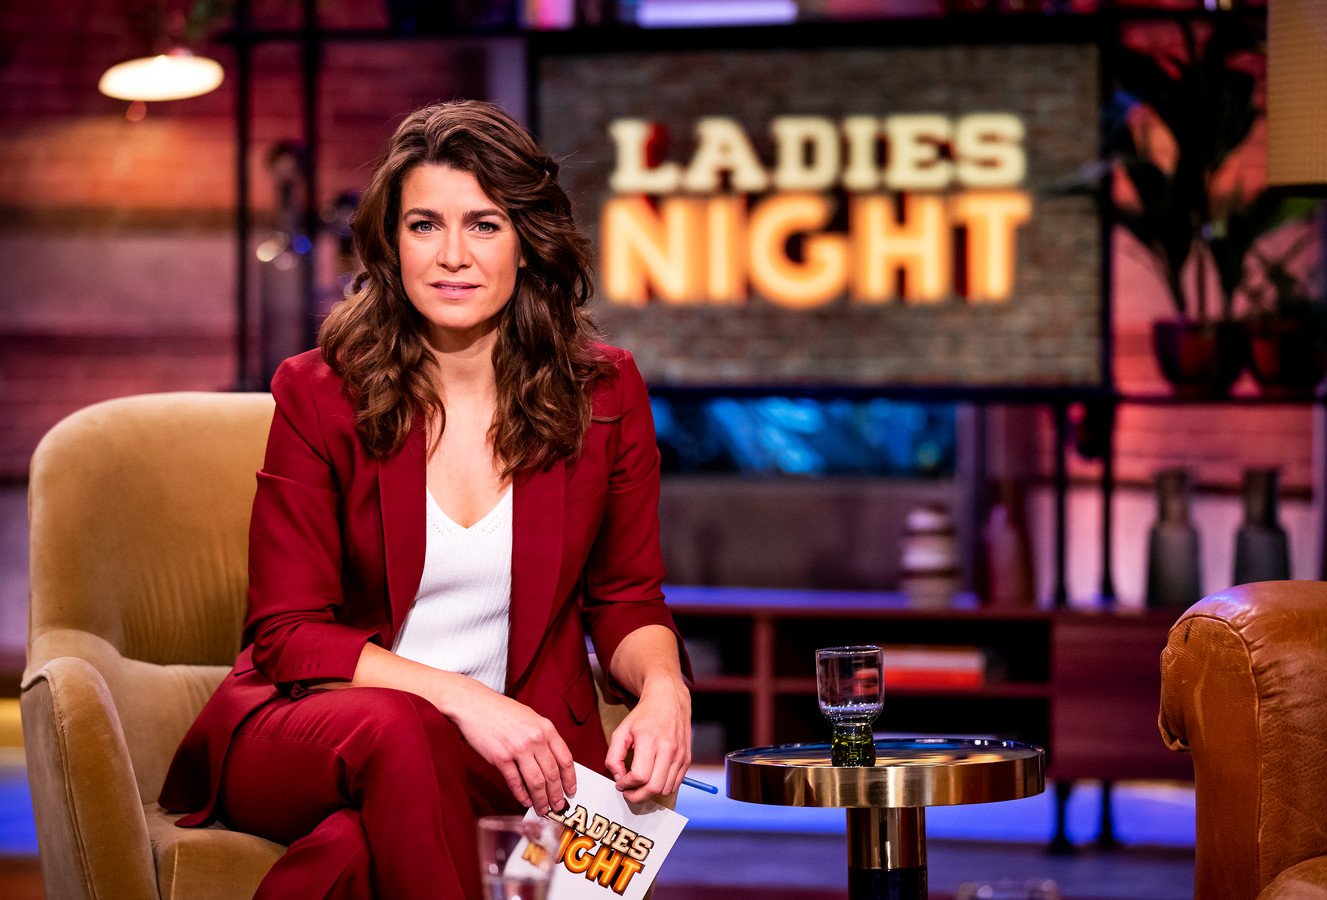 Westrik als presentatrice van Ladies Night